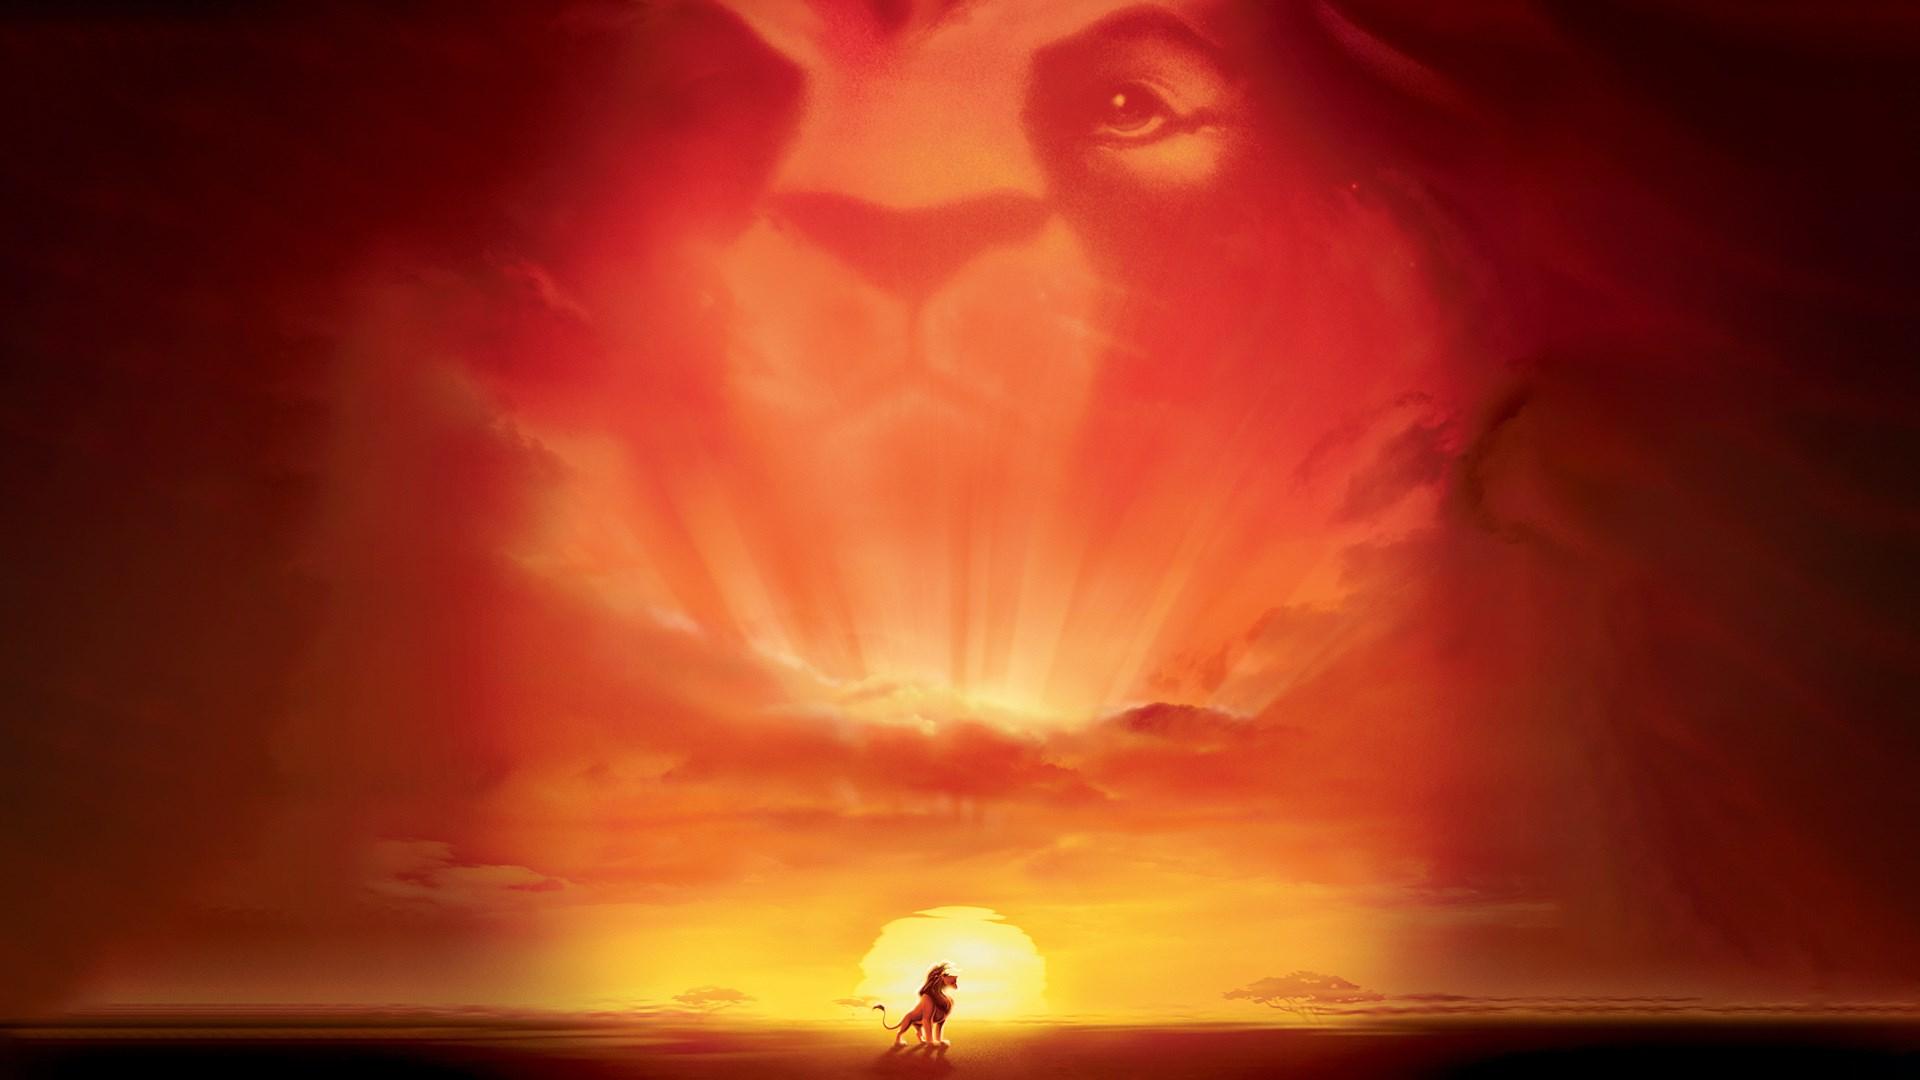 19201080 Free Screensaver The Lion King Wallpaper Lion